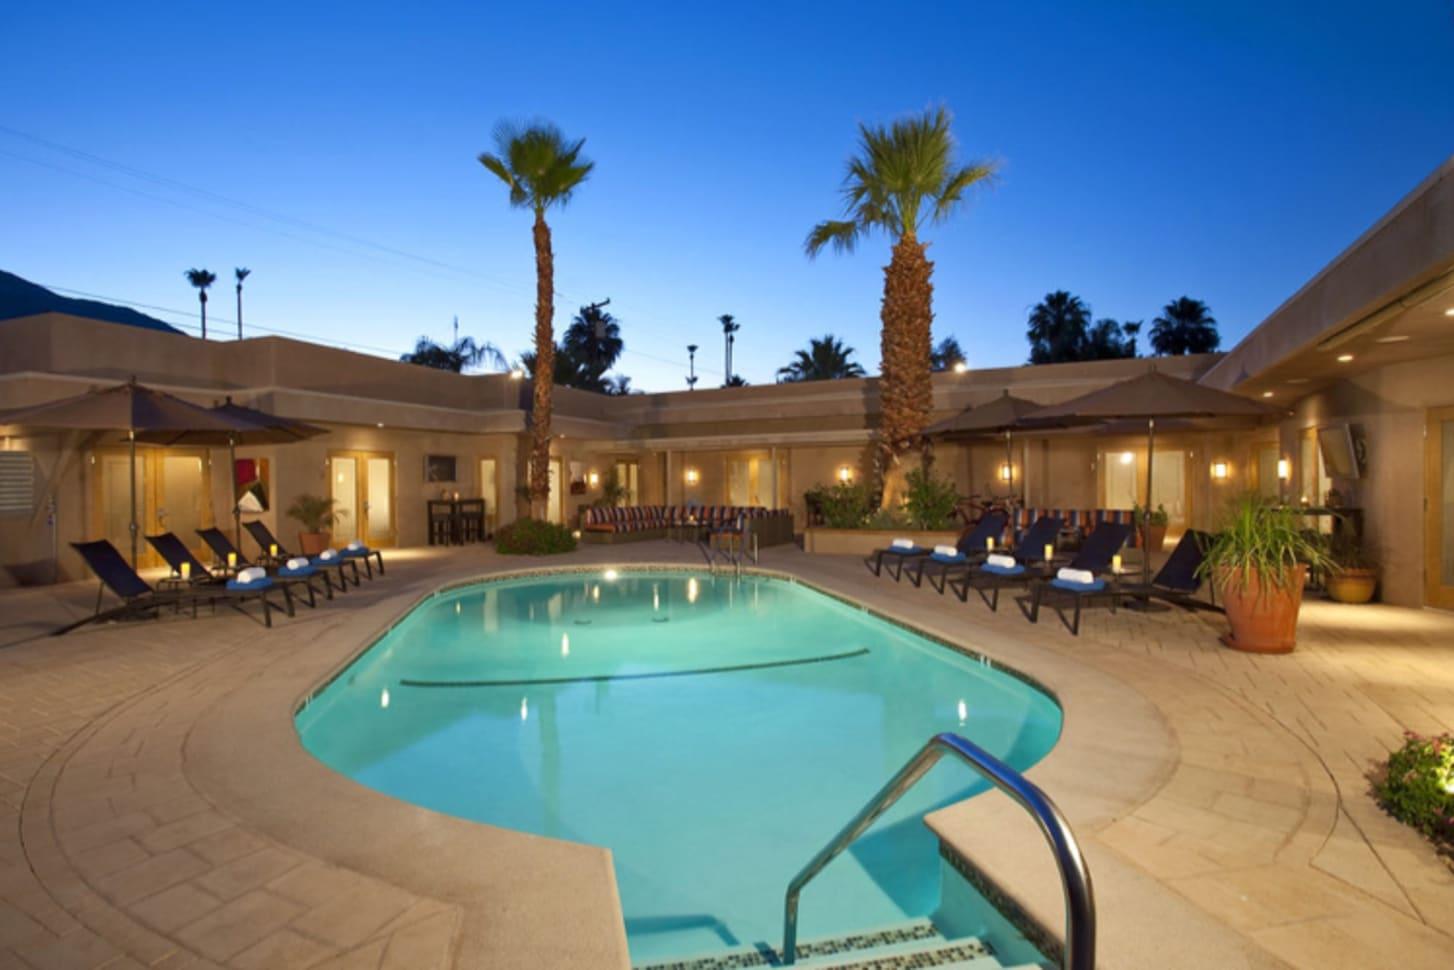 Platinum suite noa noa boutique resort gay palm springs for Exotic motors palm springs